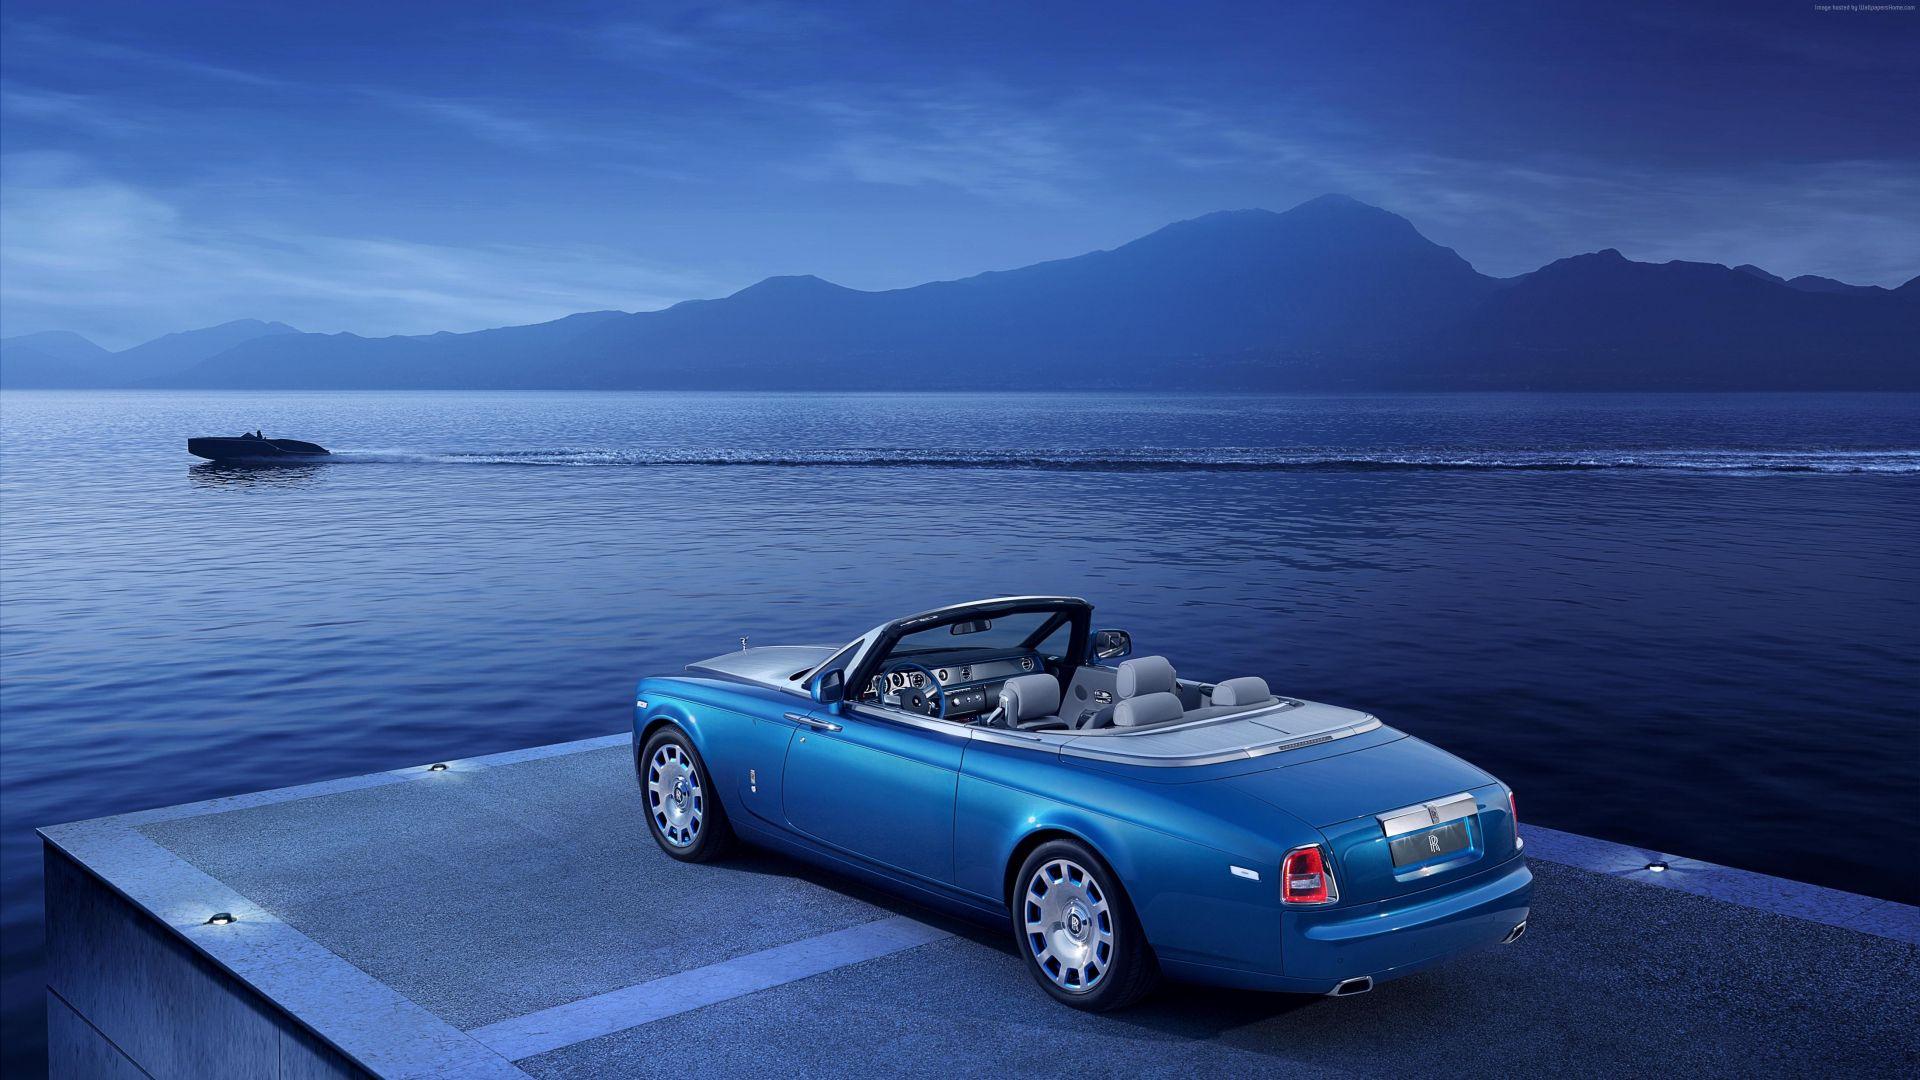 Wallpaper Rolls-Royce Phantom drophead coupe luxury car